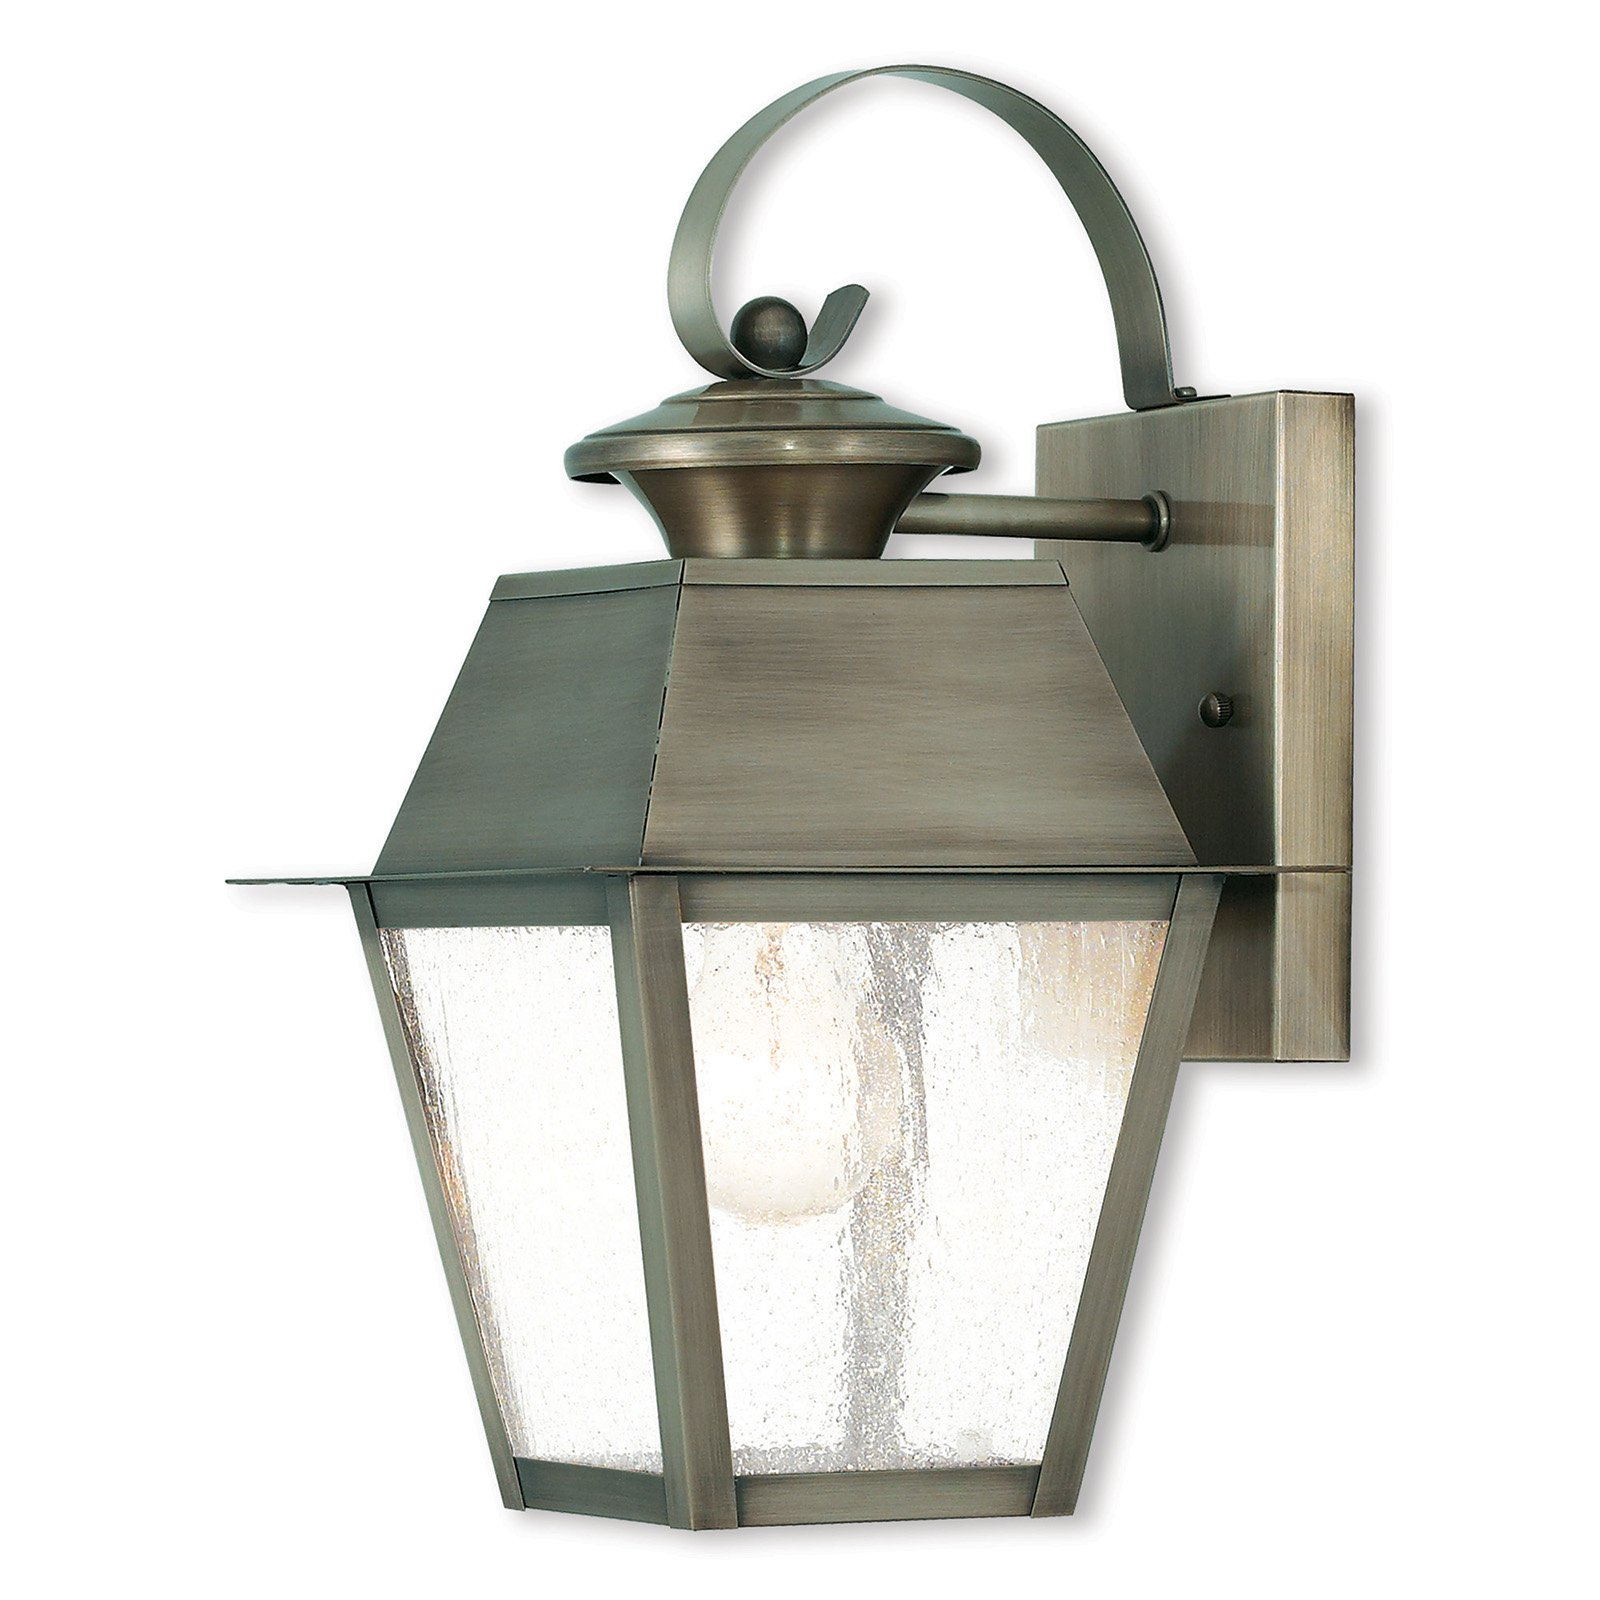 Livex Lighting Mansfield 1 Light Outdoor Wall Lantern